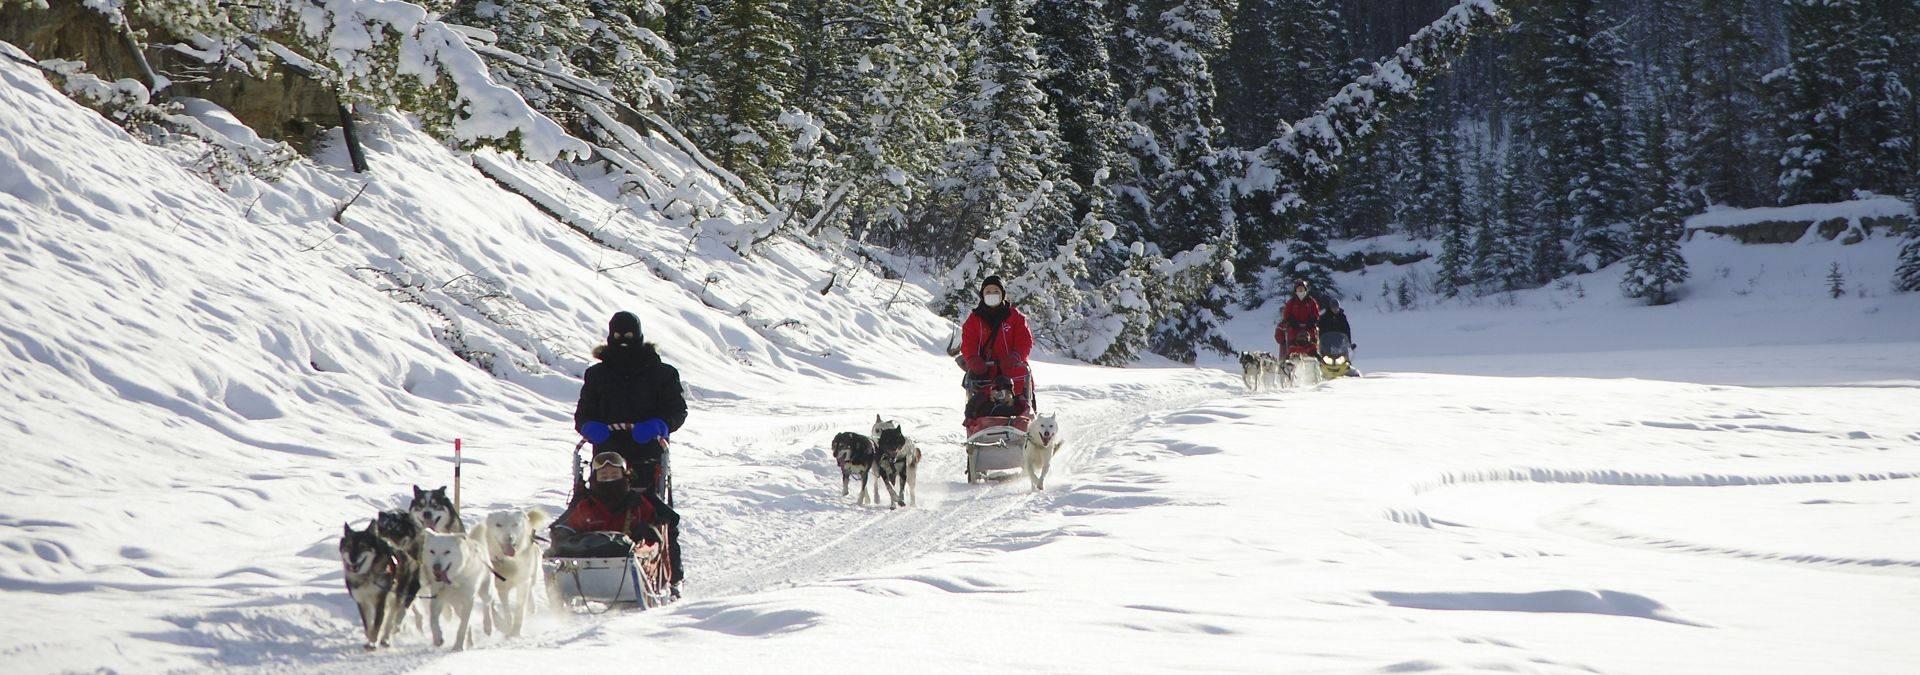 Dog Sledding 4 Credit Arctic Range Adventure Ltd